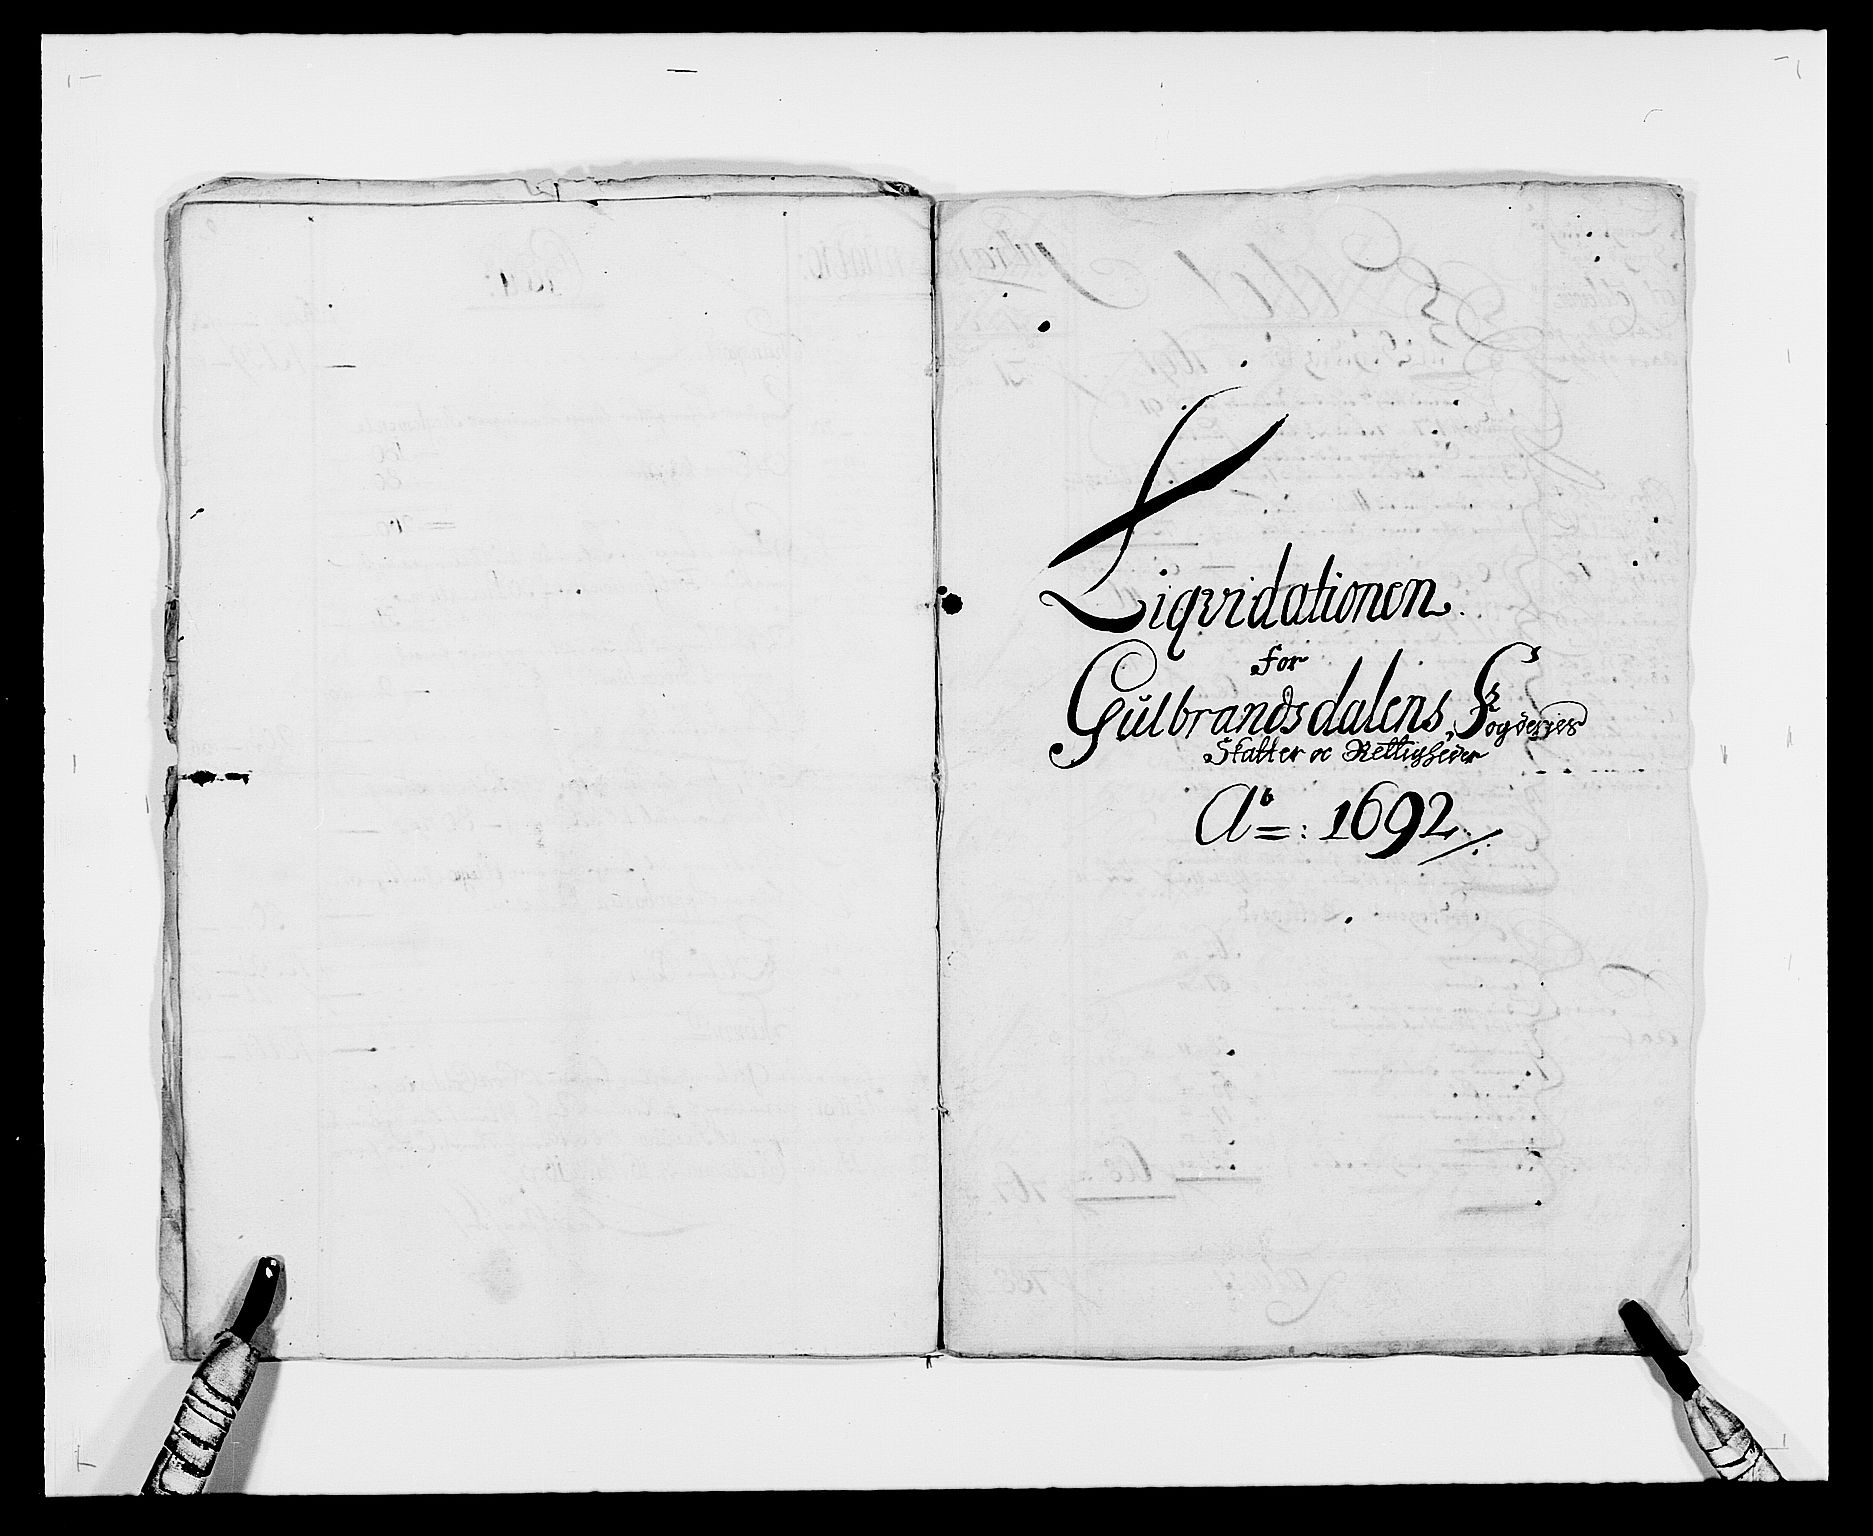 RA, Rentekammeret inntil 1814, Reviderte regnskaper, Fogderegnskap, R17/L1165: Fogderegnskap Gudbrandsdal, 1690-1692, s. 13